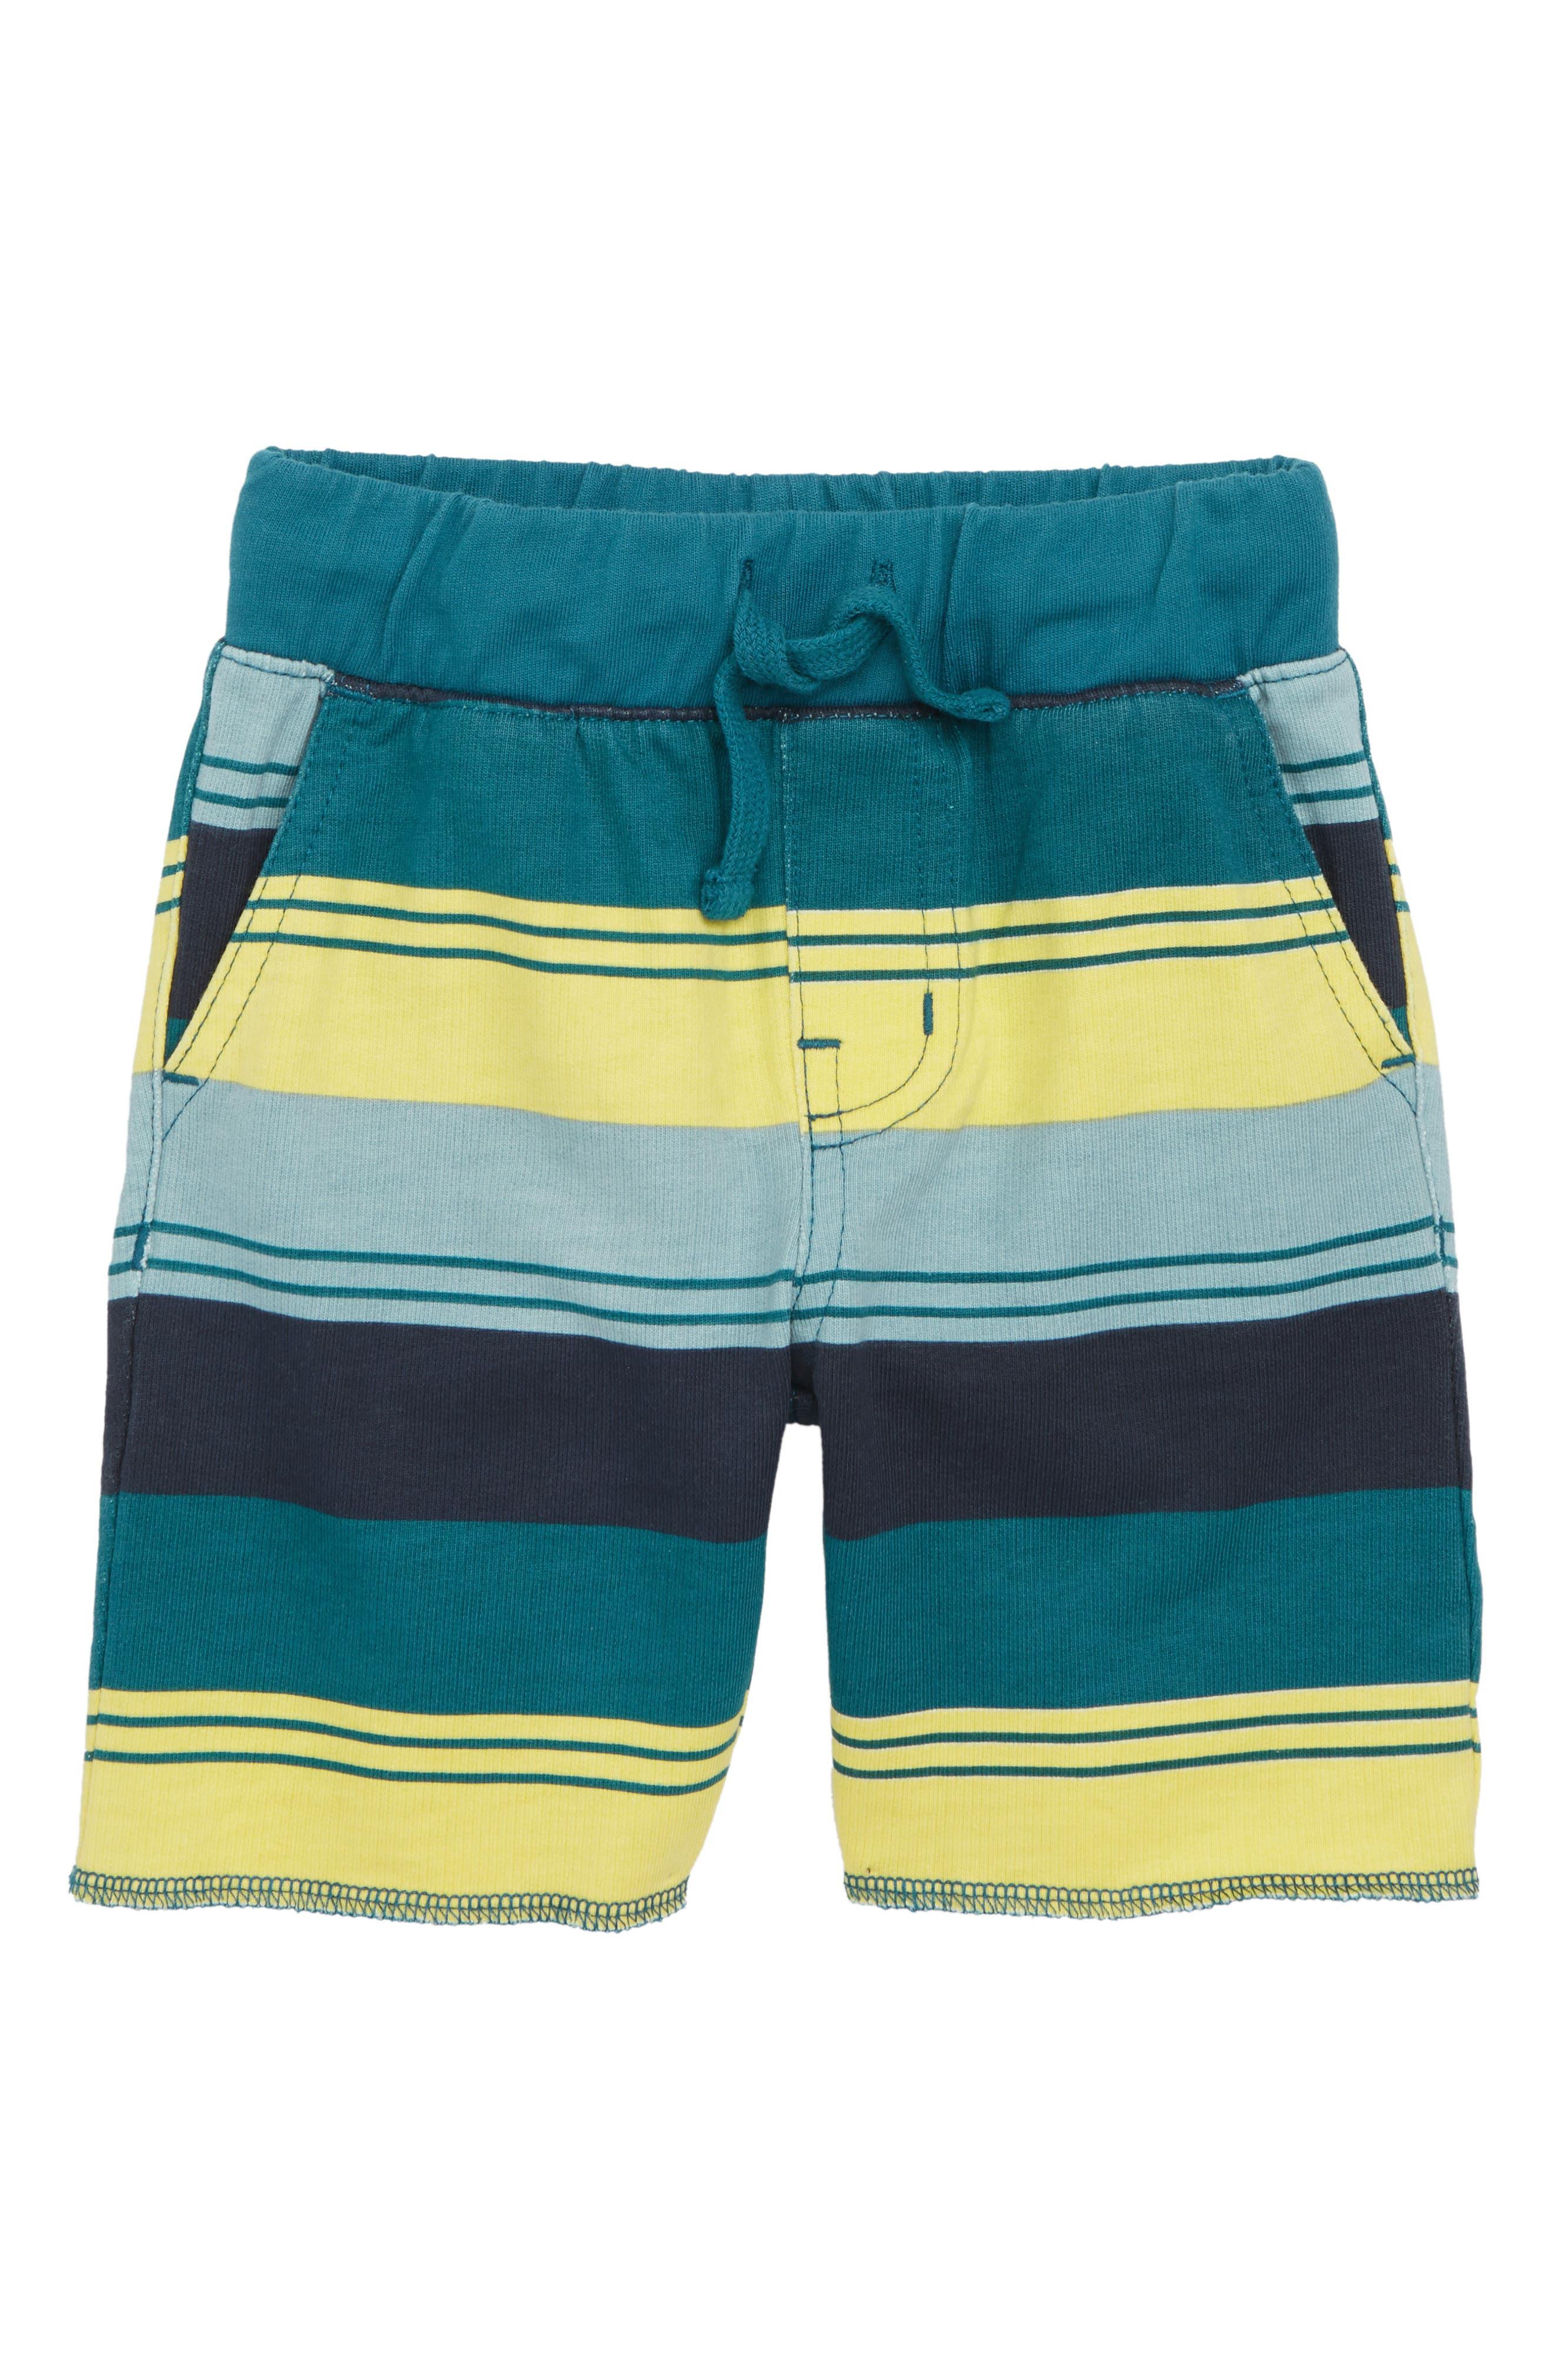 Stripe Cruiser Shorts,                             Main thumbnail 1, color,                             Indigo Tri-Stripe